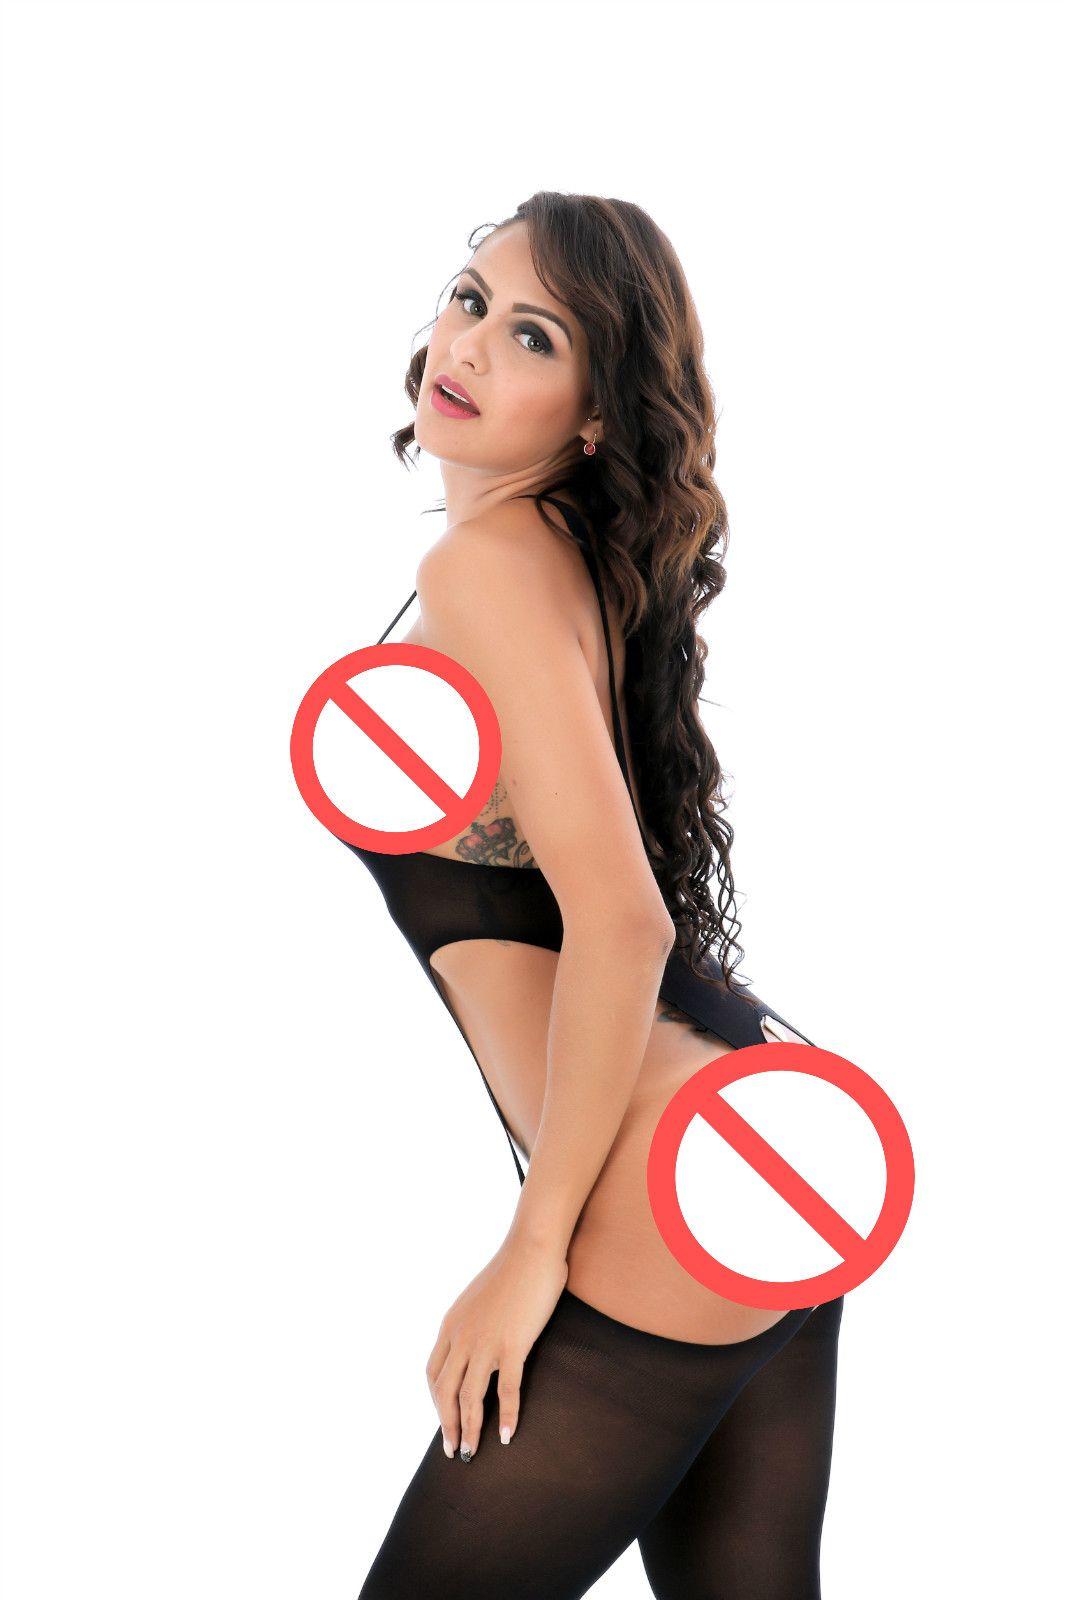 2017 Sexy Corps Nylon Tentation Femmes Sexy Halter Sans Manches Dos Ouvert Sheer Ouvert Entrejambe Avant Creux Résille Transparent Bodystocking